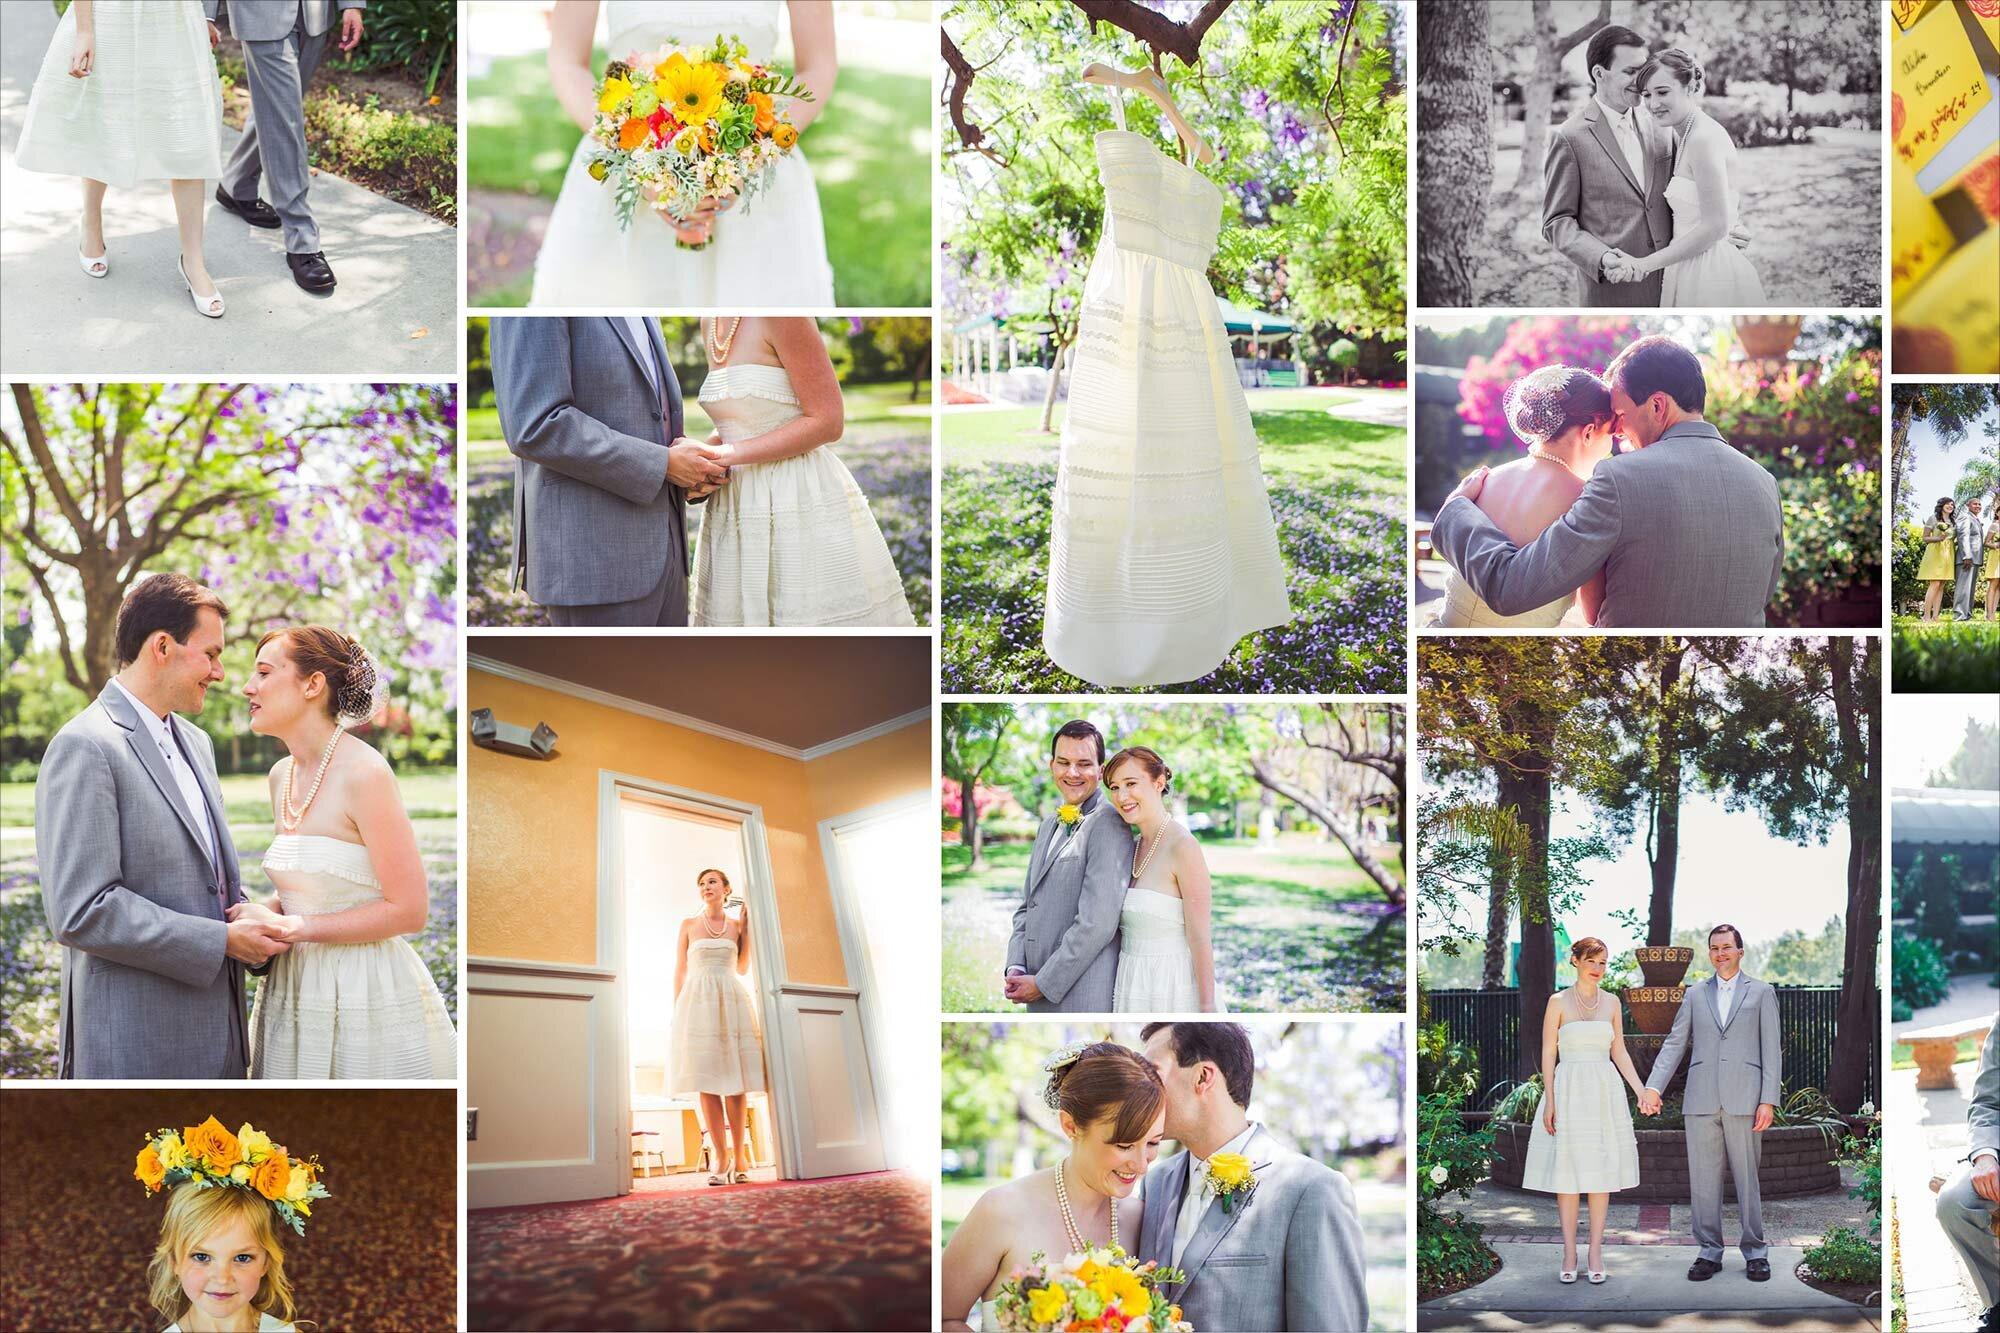 wedding_portrais_gallery_stephen_grant_photography.jpg